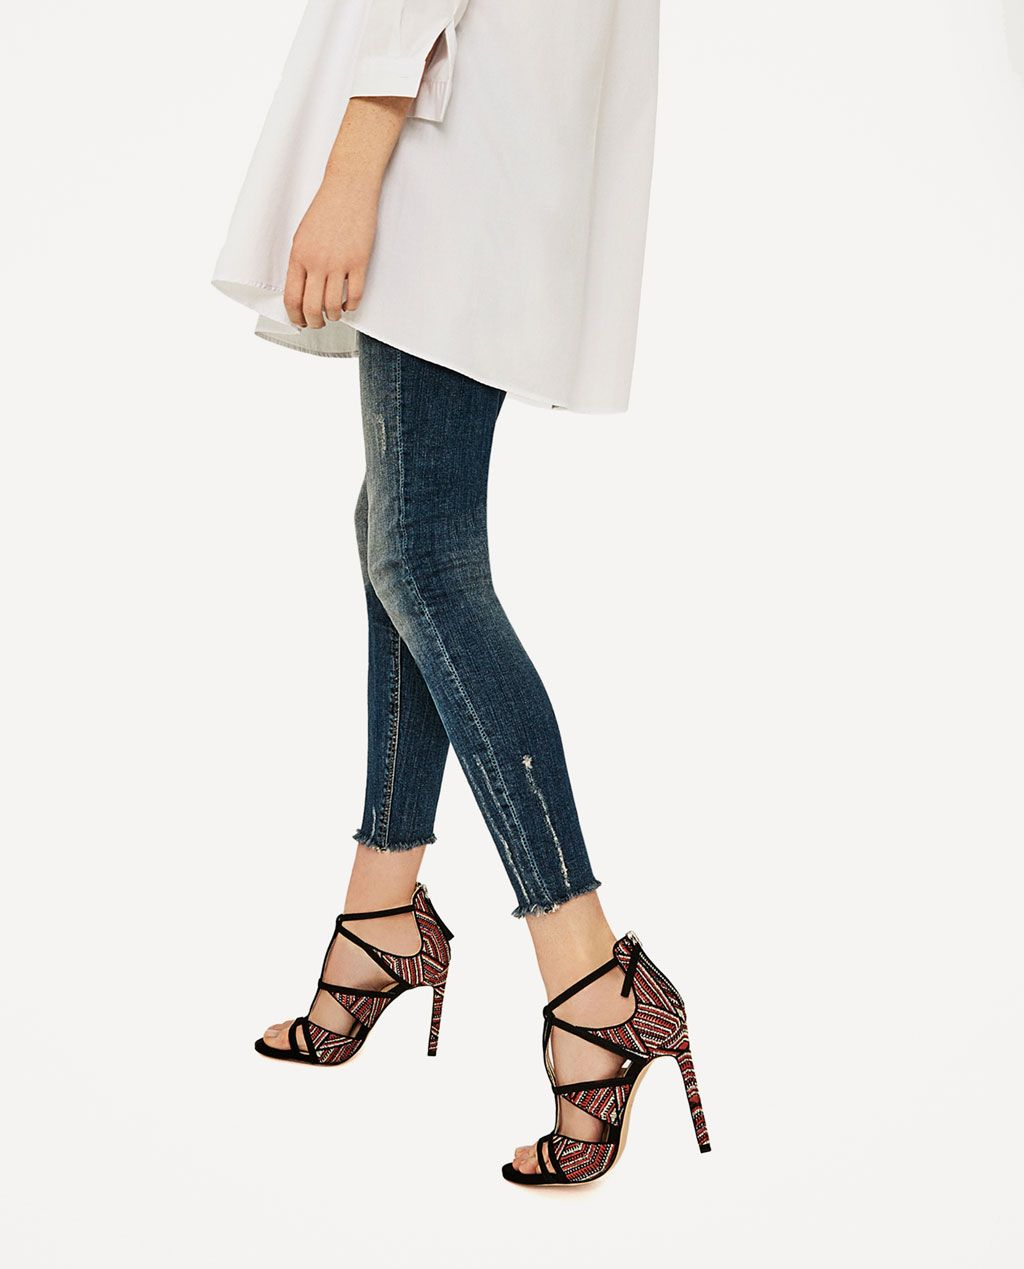 CombinadoShoes Tacón Mujer Sandalia Tejido Zara Zapatos 4L35RAj